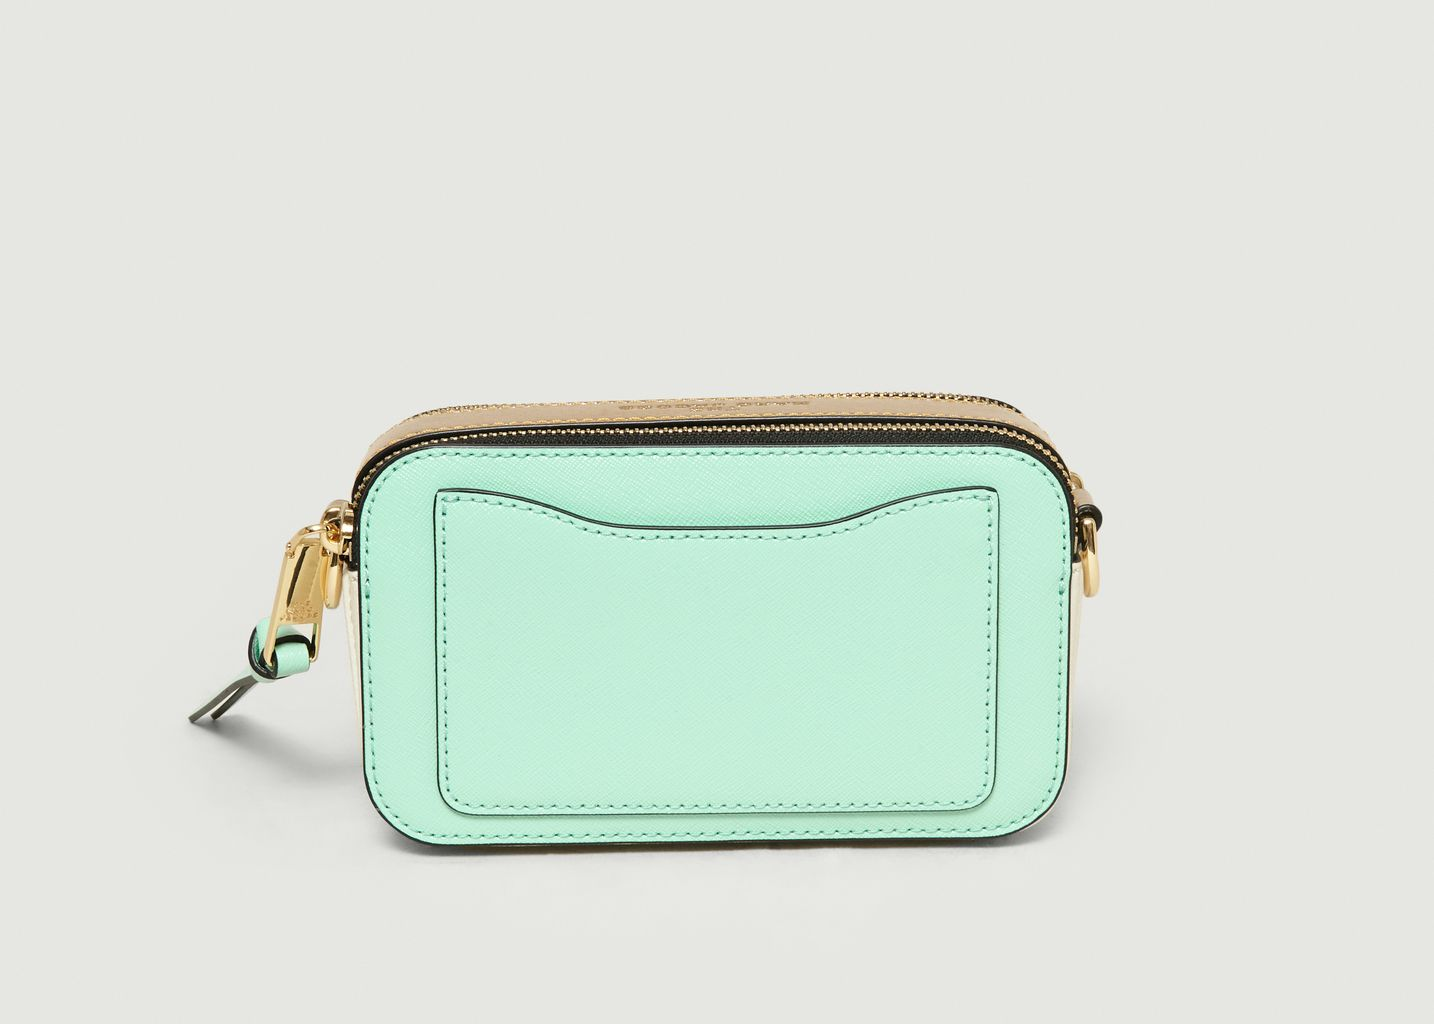 Sac The Snapshot small camera bag - The Marc Jacobs